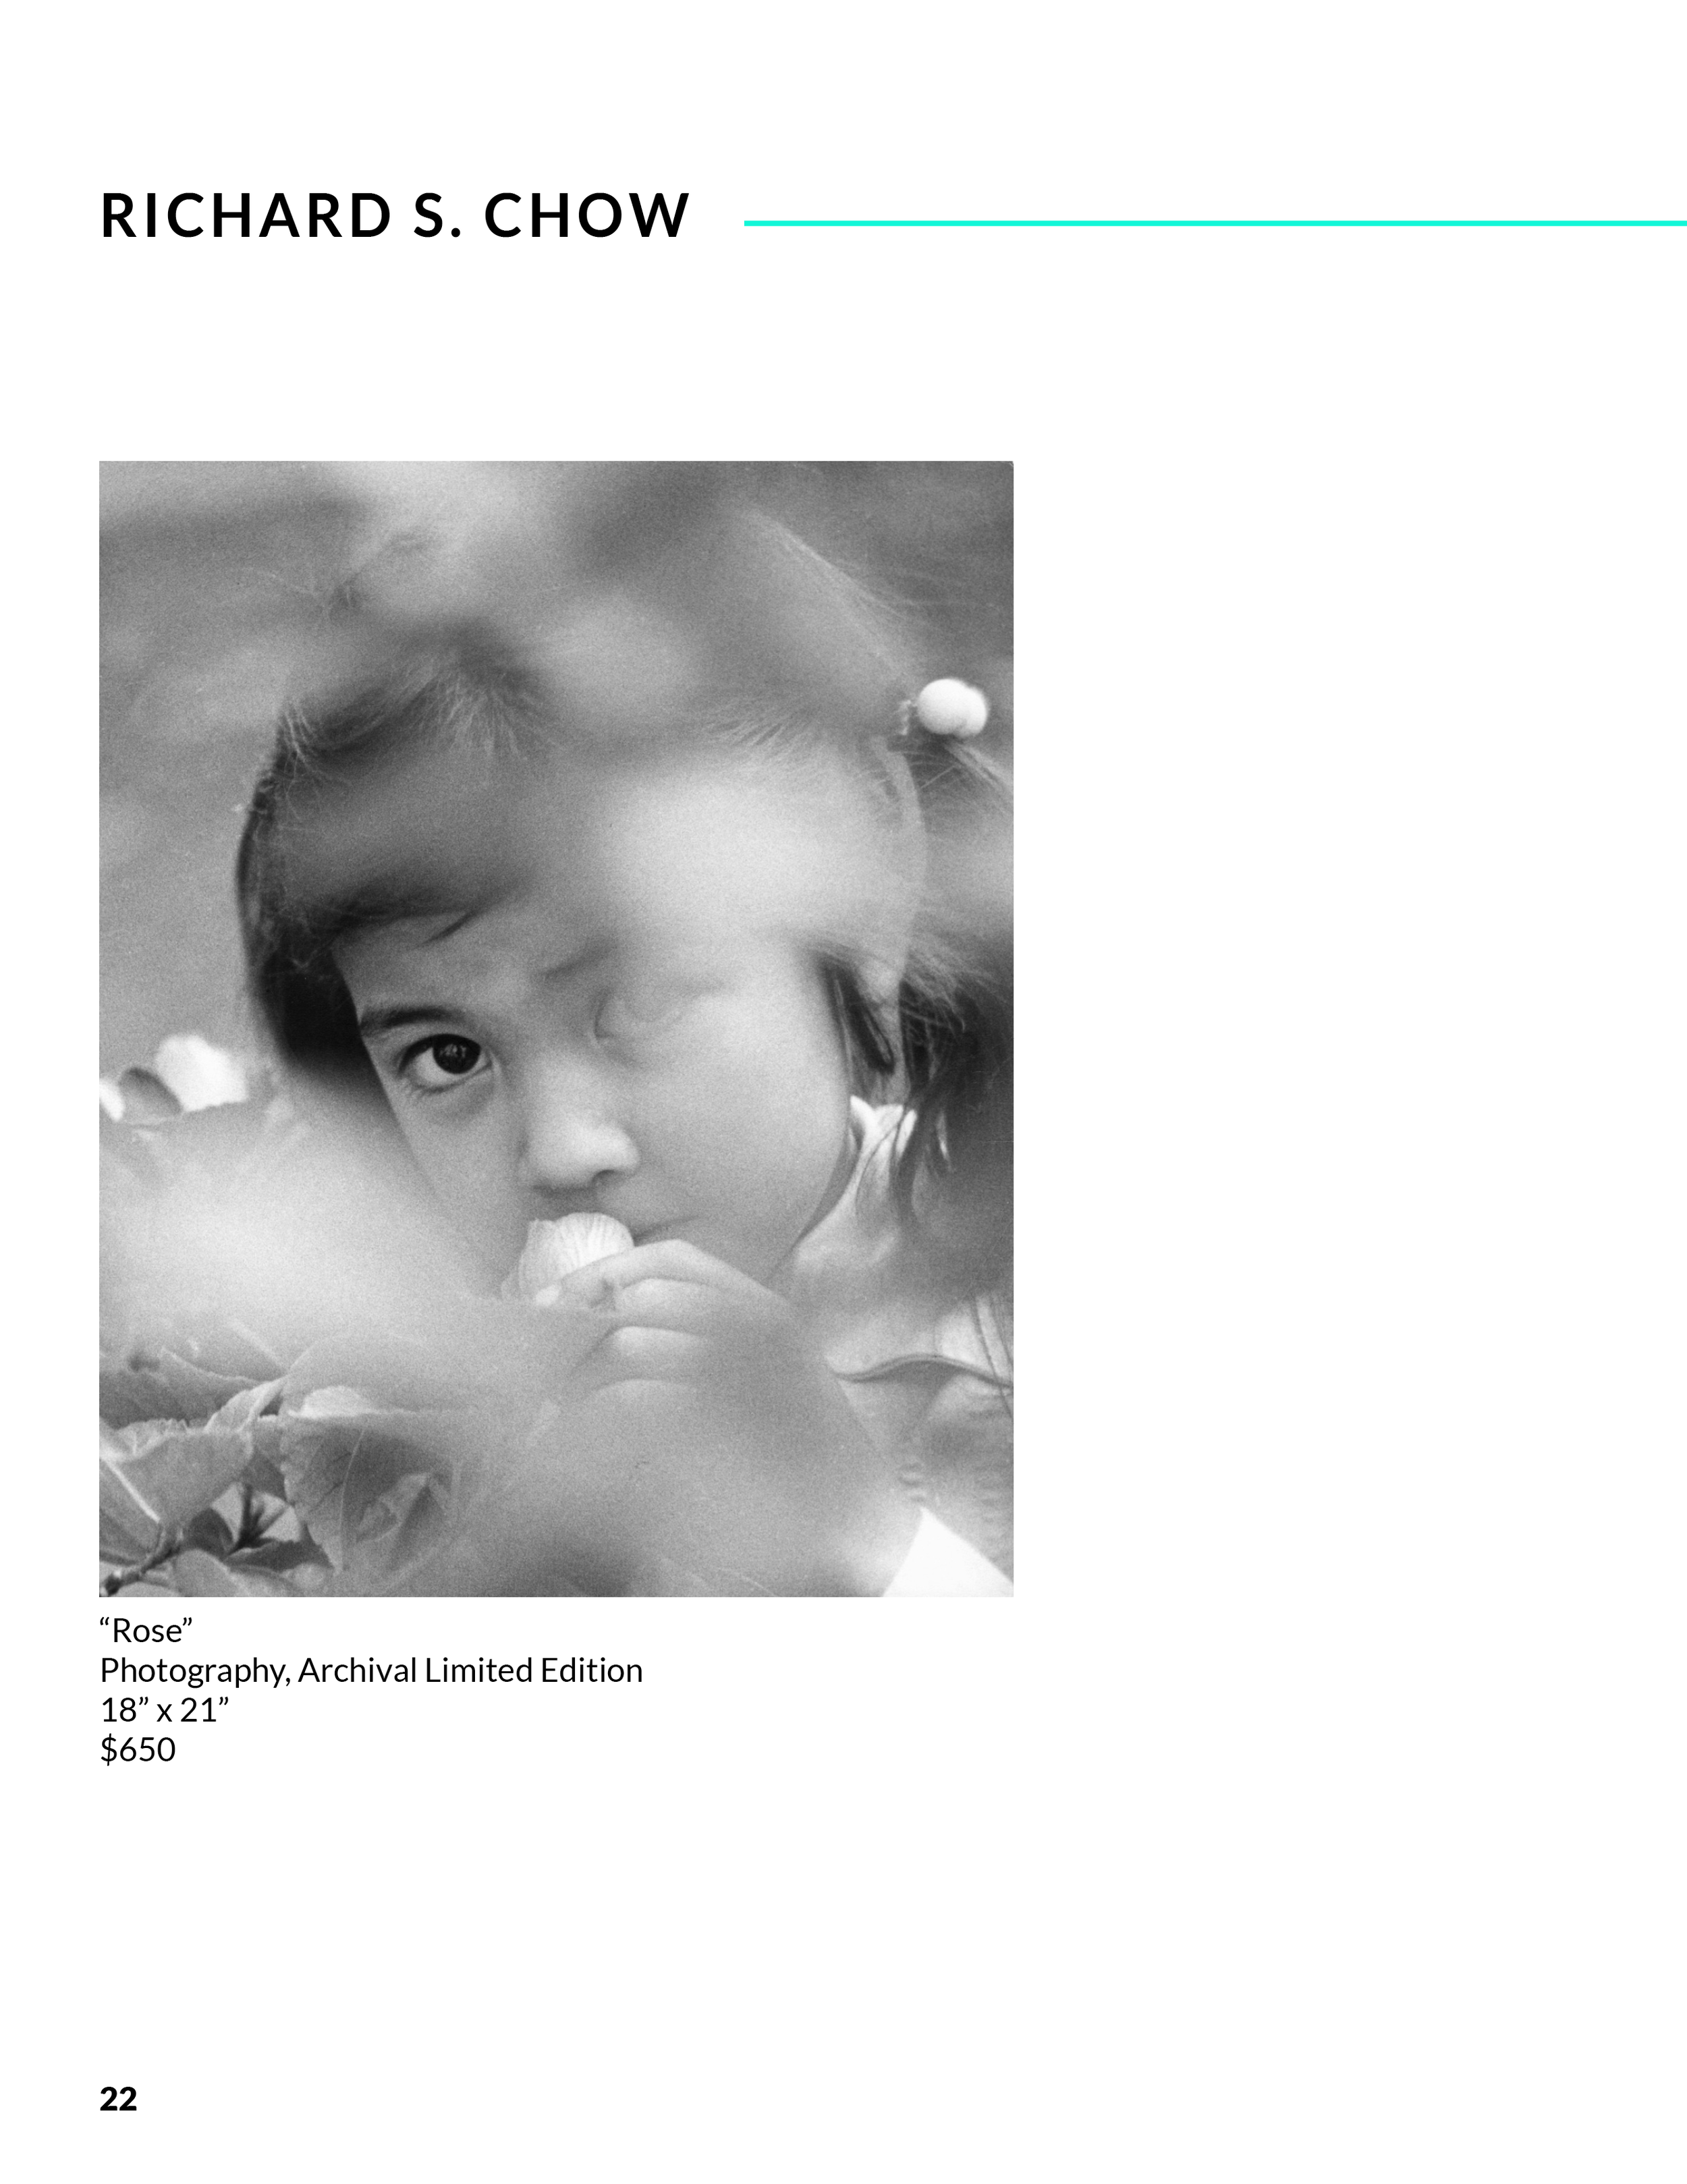 Catalog-Final22.png